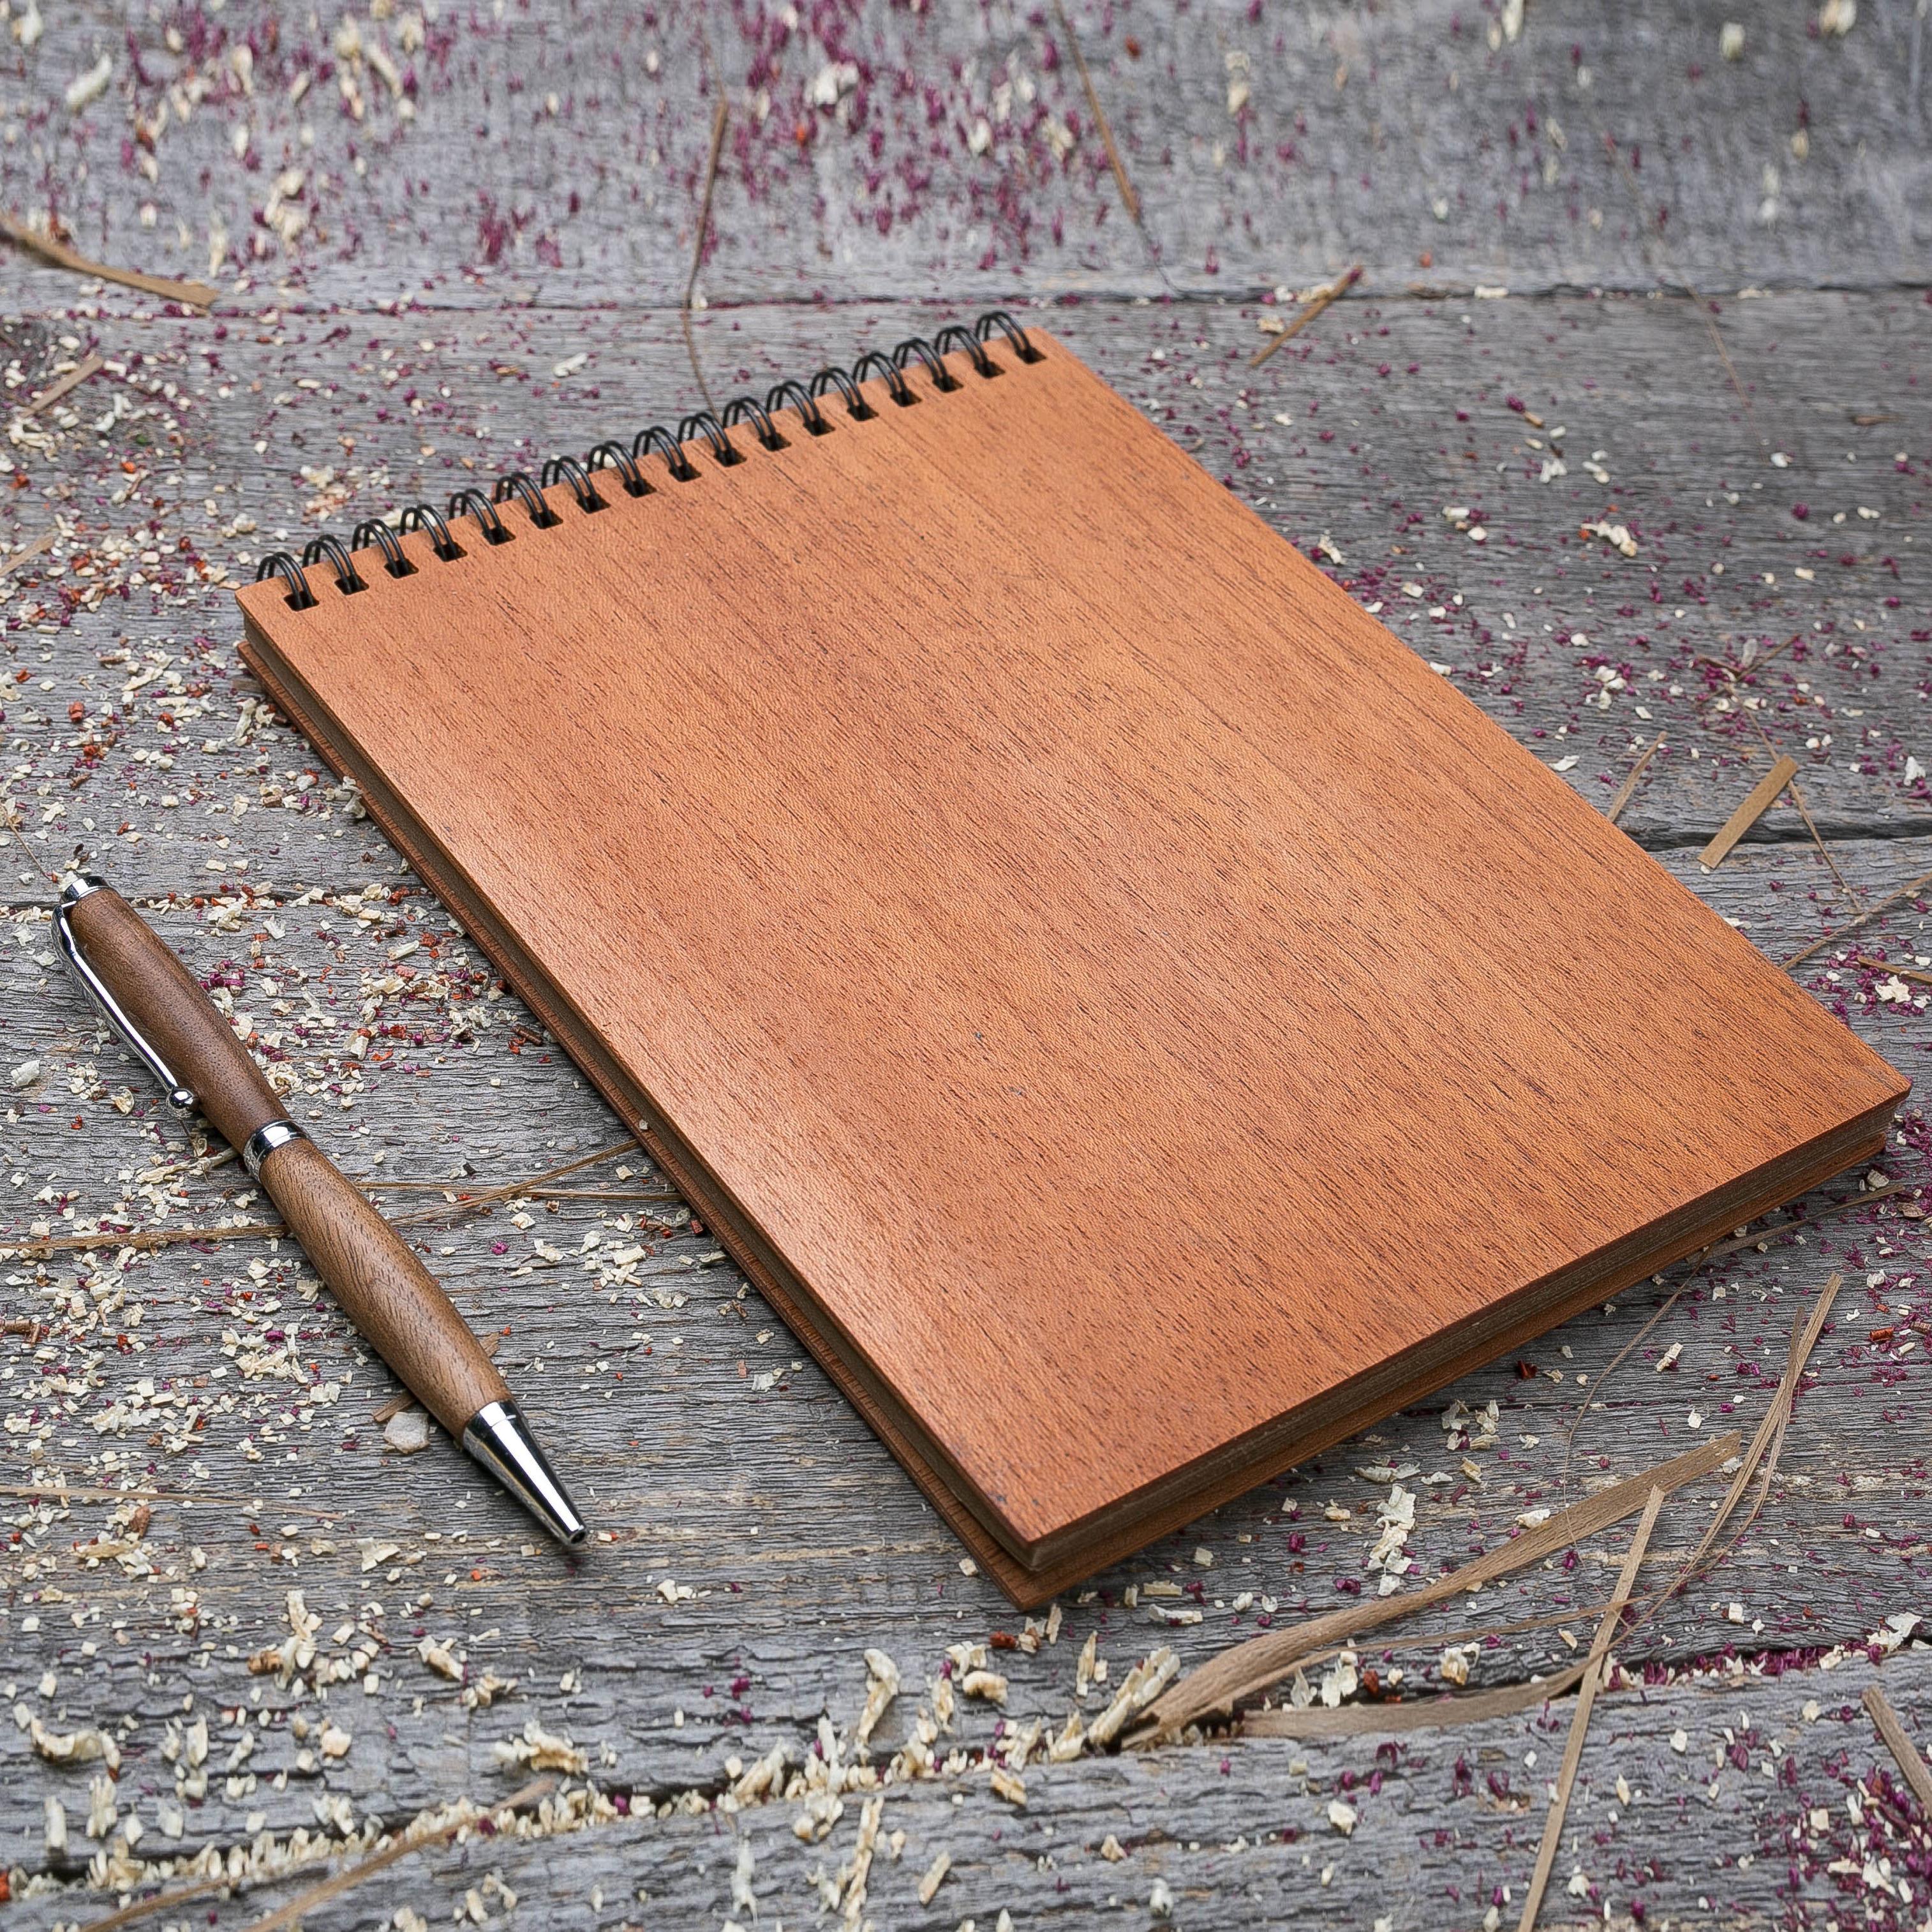 Скетчбук А5 с обложкой из дерева махагон на 40 страниц. 148х210 мм. Крафт бумага. Любая гравировка на обложке TW-Notebook-Craft-Mahagon-A5